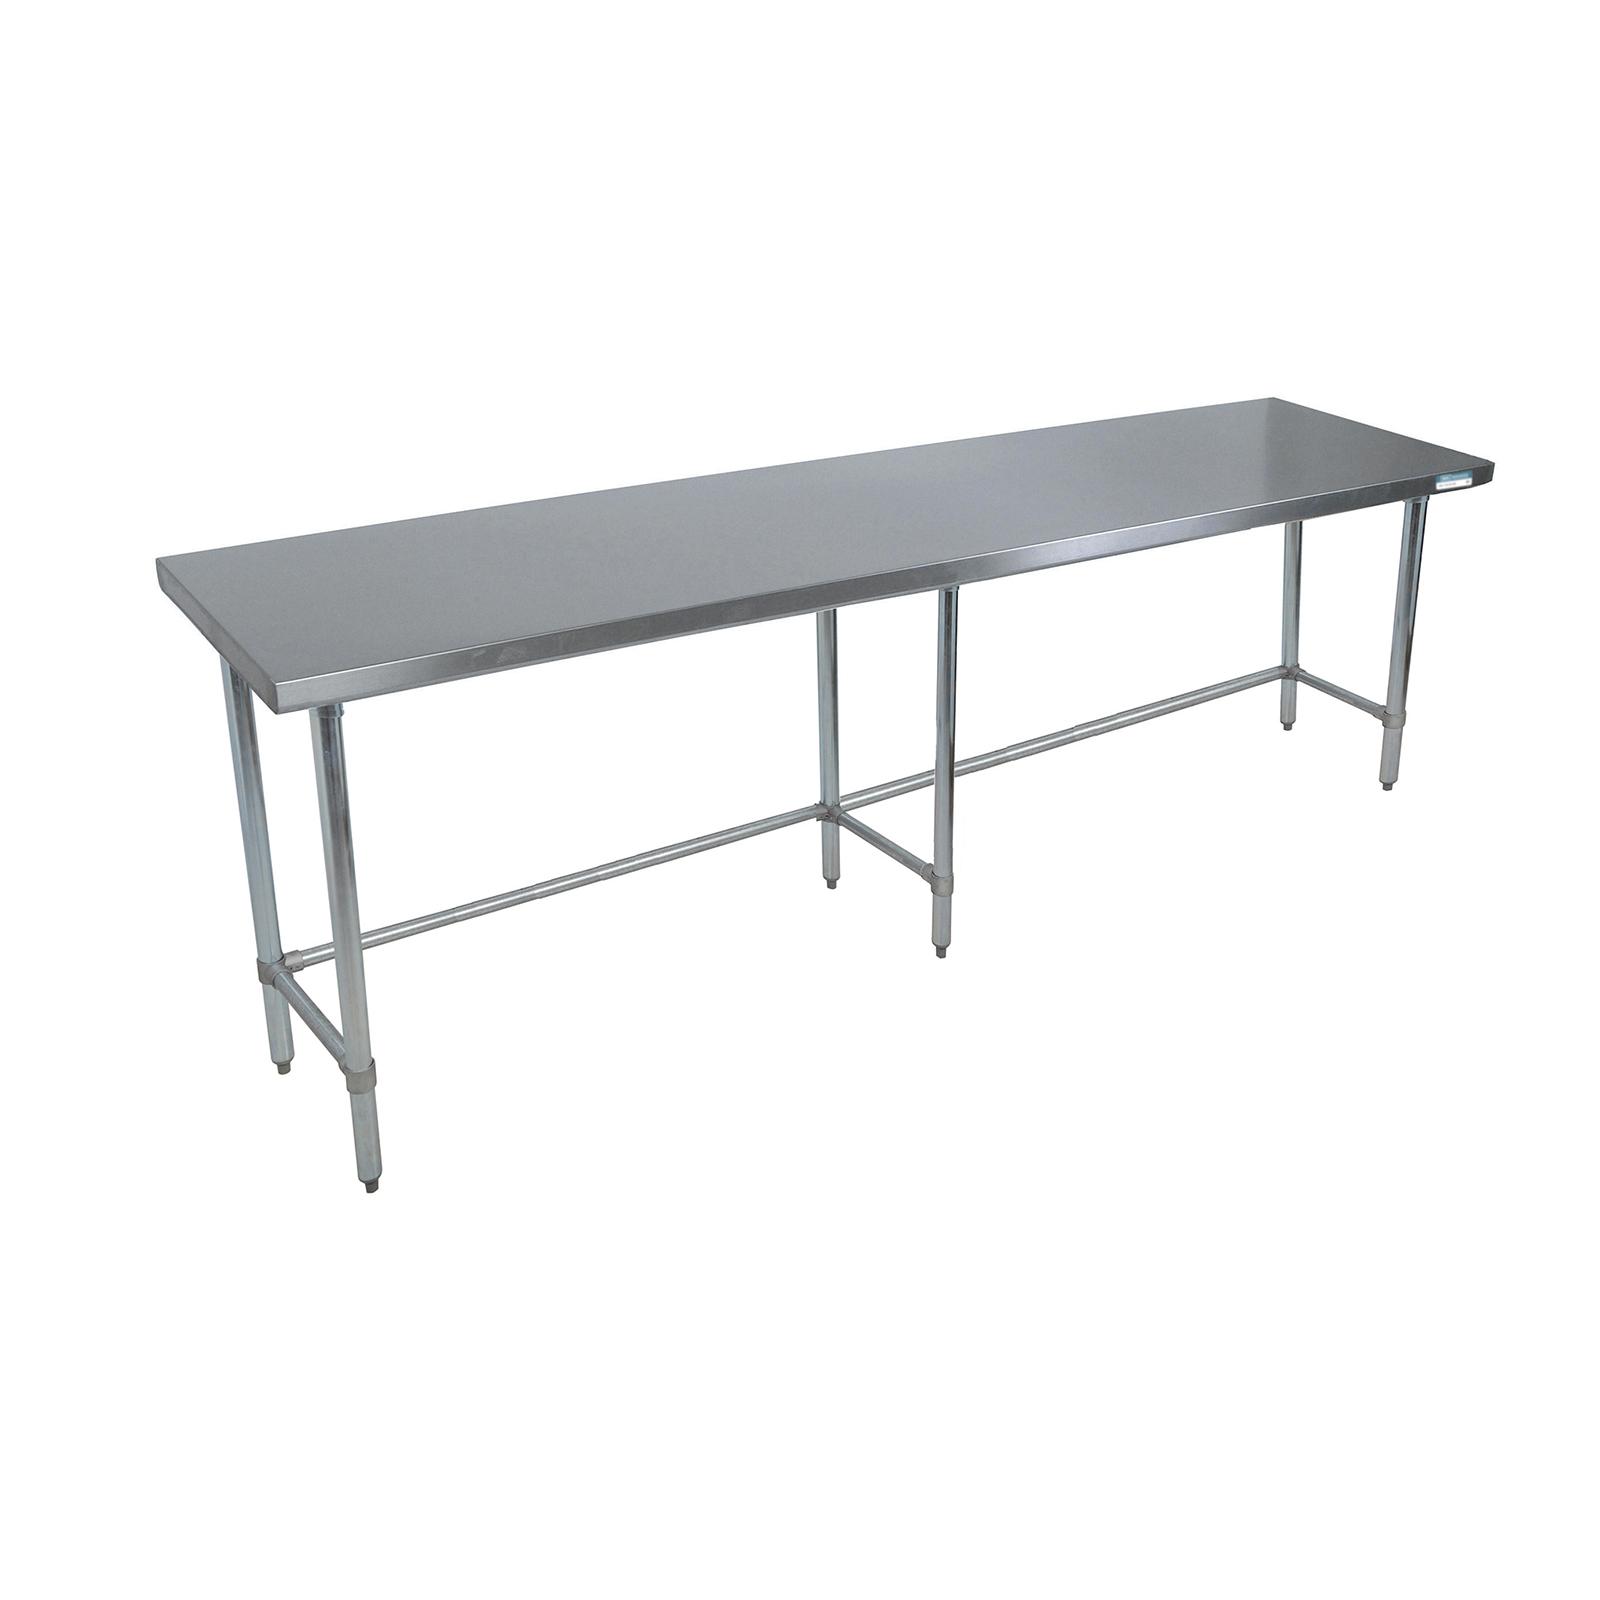 BK Resources SVTOB-9630 work table,  85